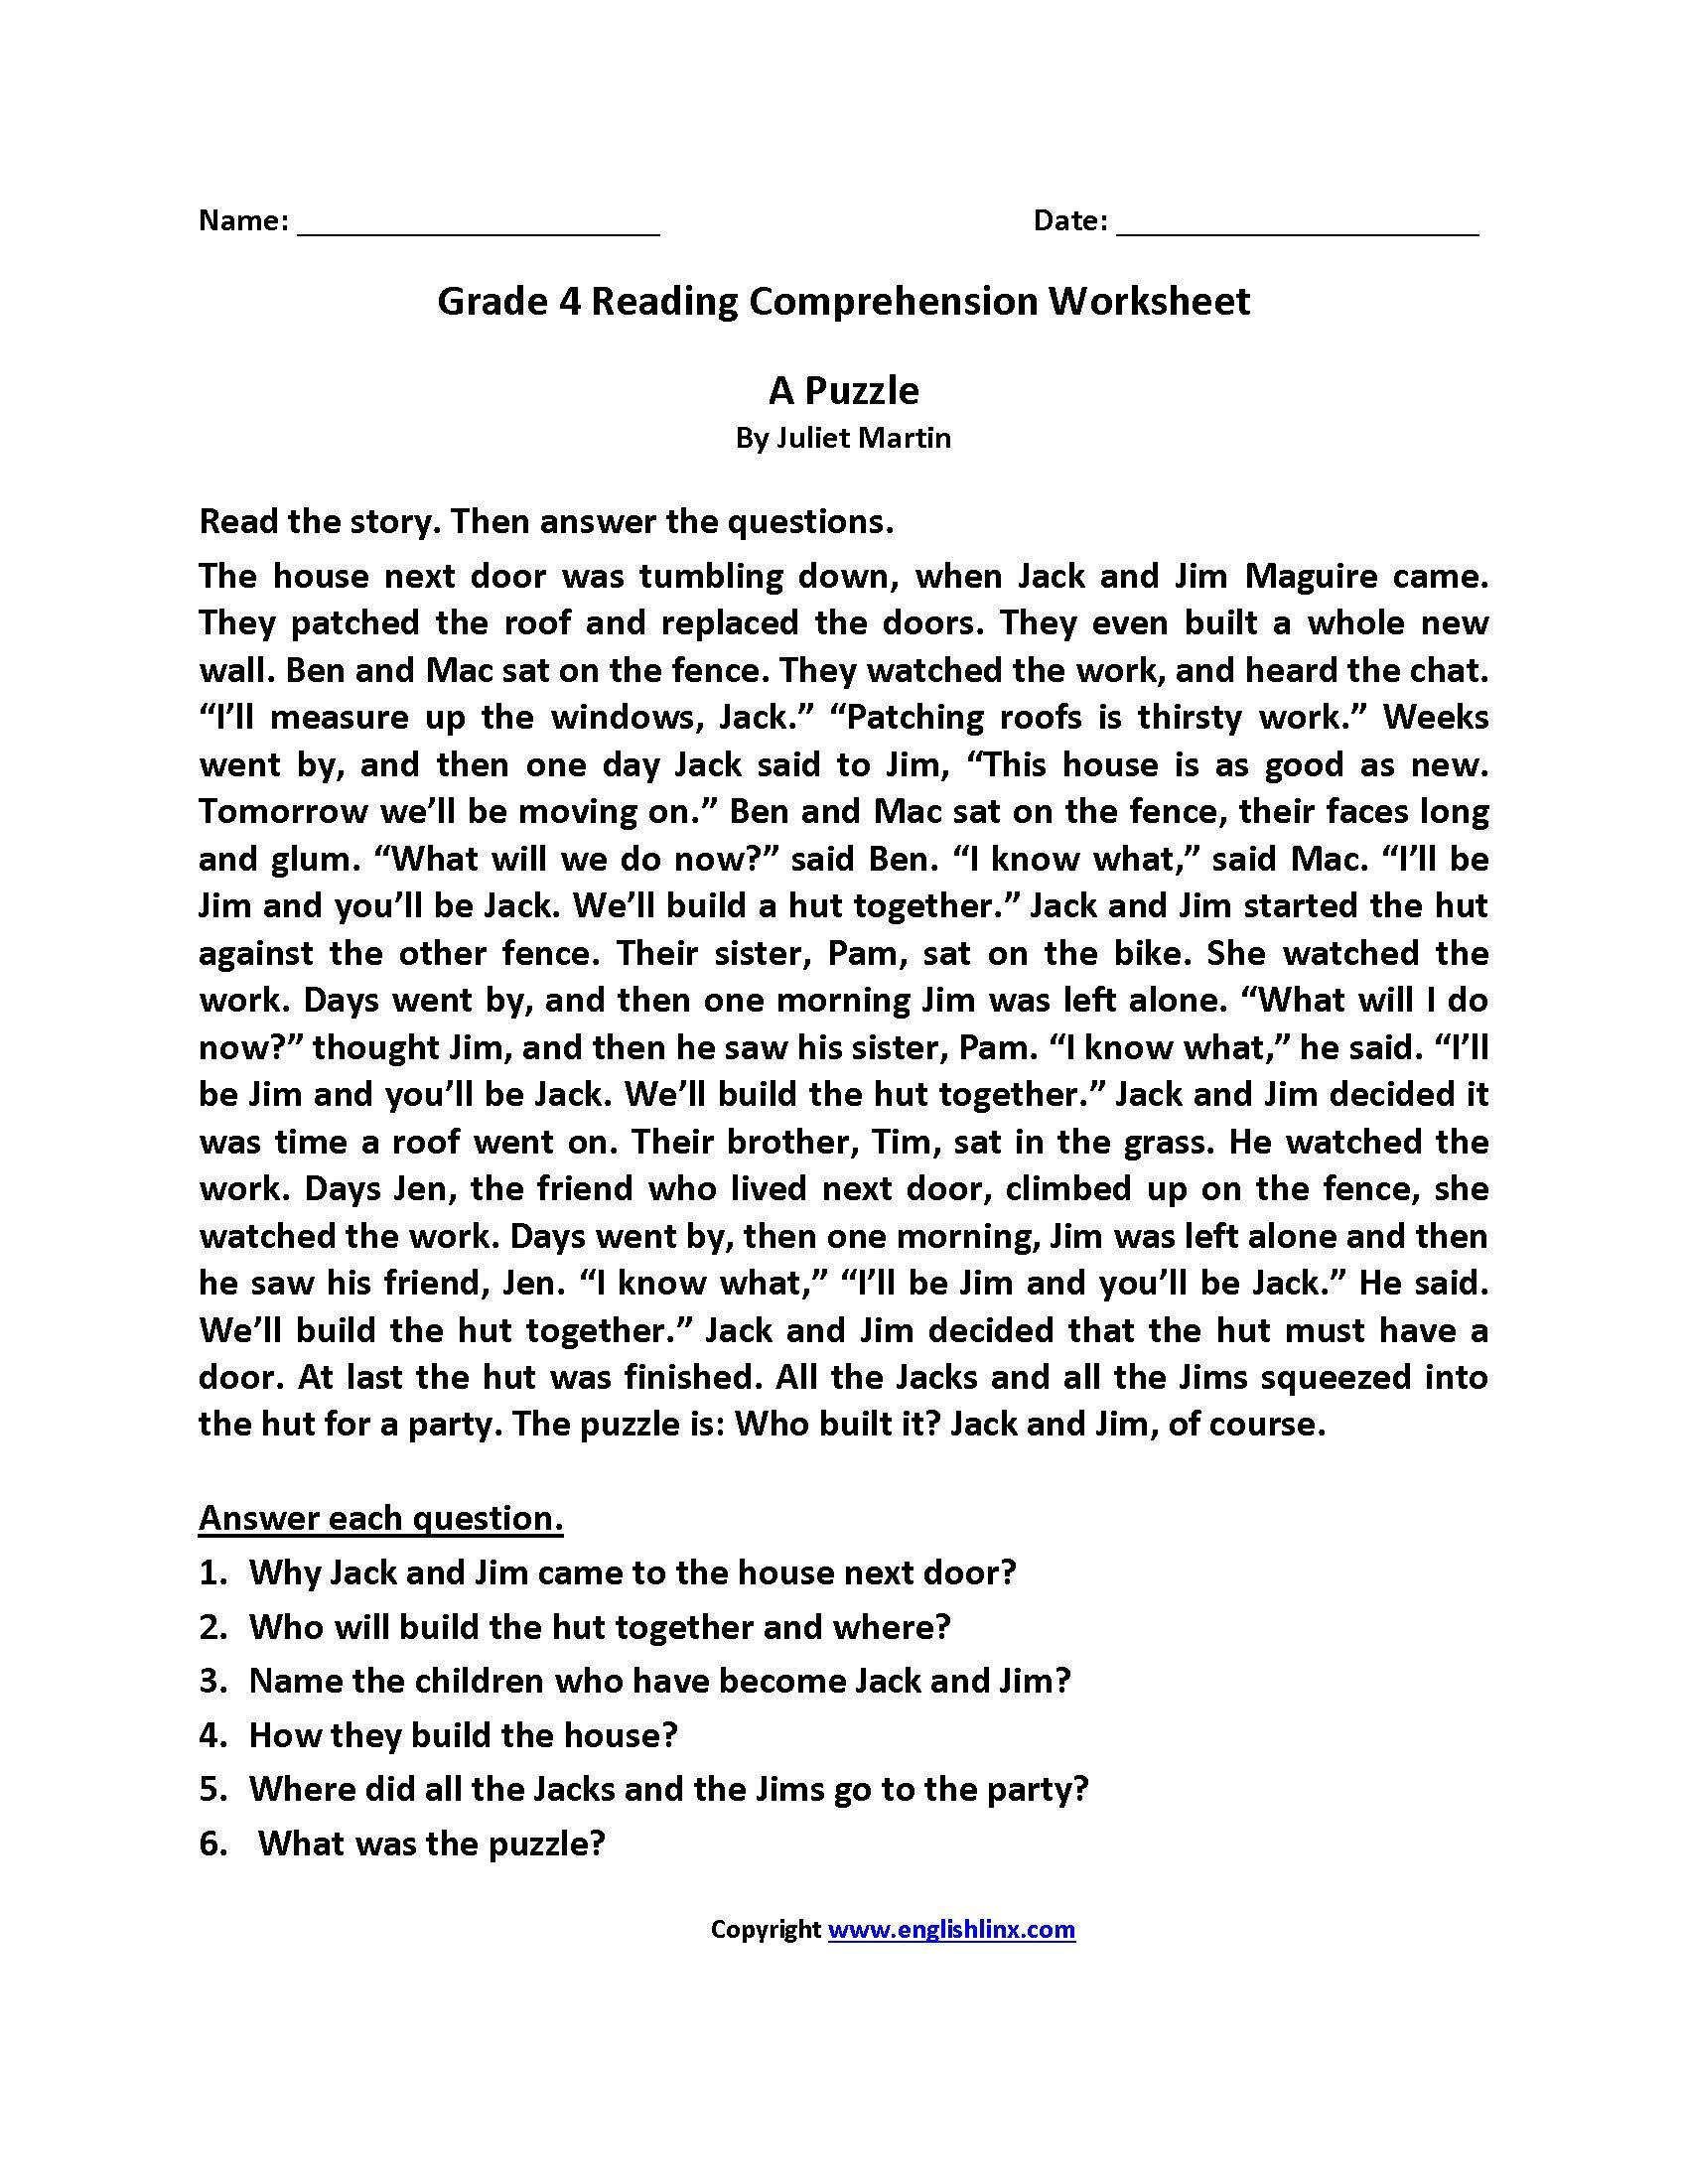 5th Grade Worksheets Printable Reading 4th Grade Reading Prehension Worksheets In 2020 Comprehension Worksheets Reading Comprehension Reading Comprehension Worksheets 5th grade reading printable worksheets